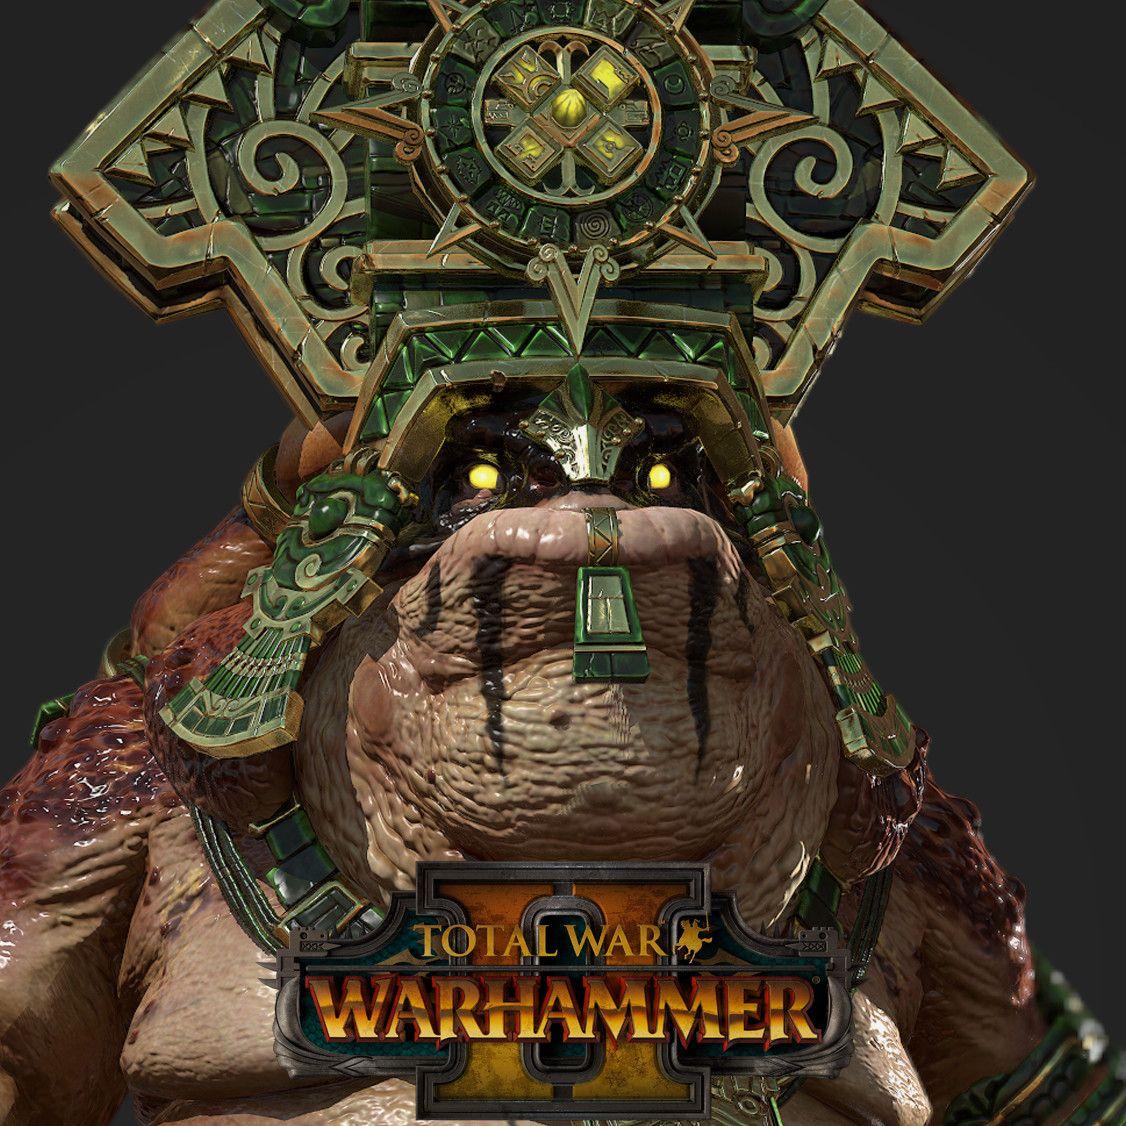 Total War: Warhammer 2 -Lord Mazdamundi, Matthew Davis on ArtStation at https://www.artstation.com/artwork/Xw81a